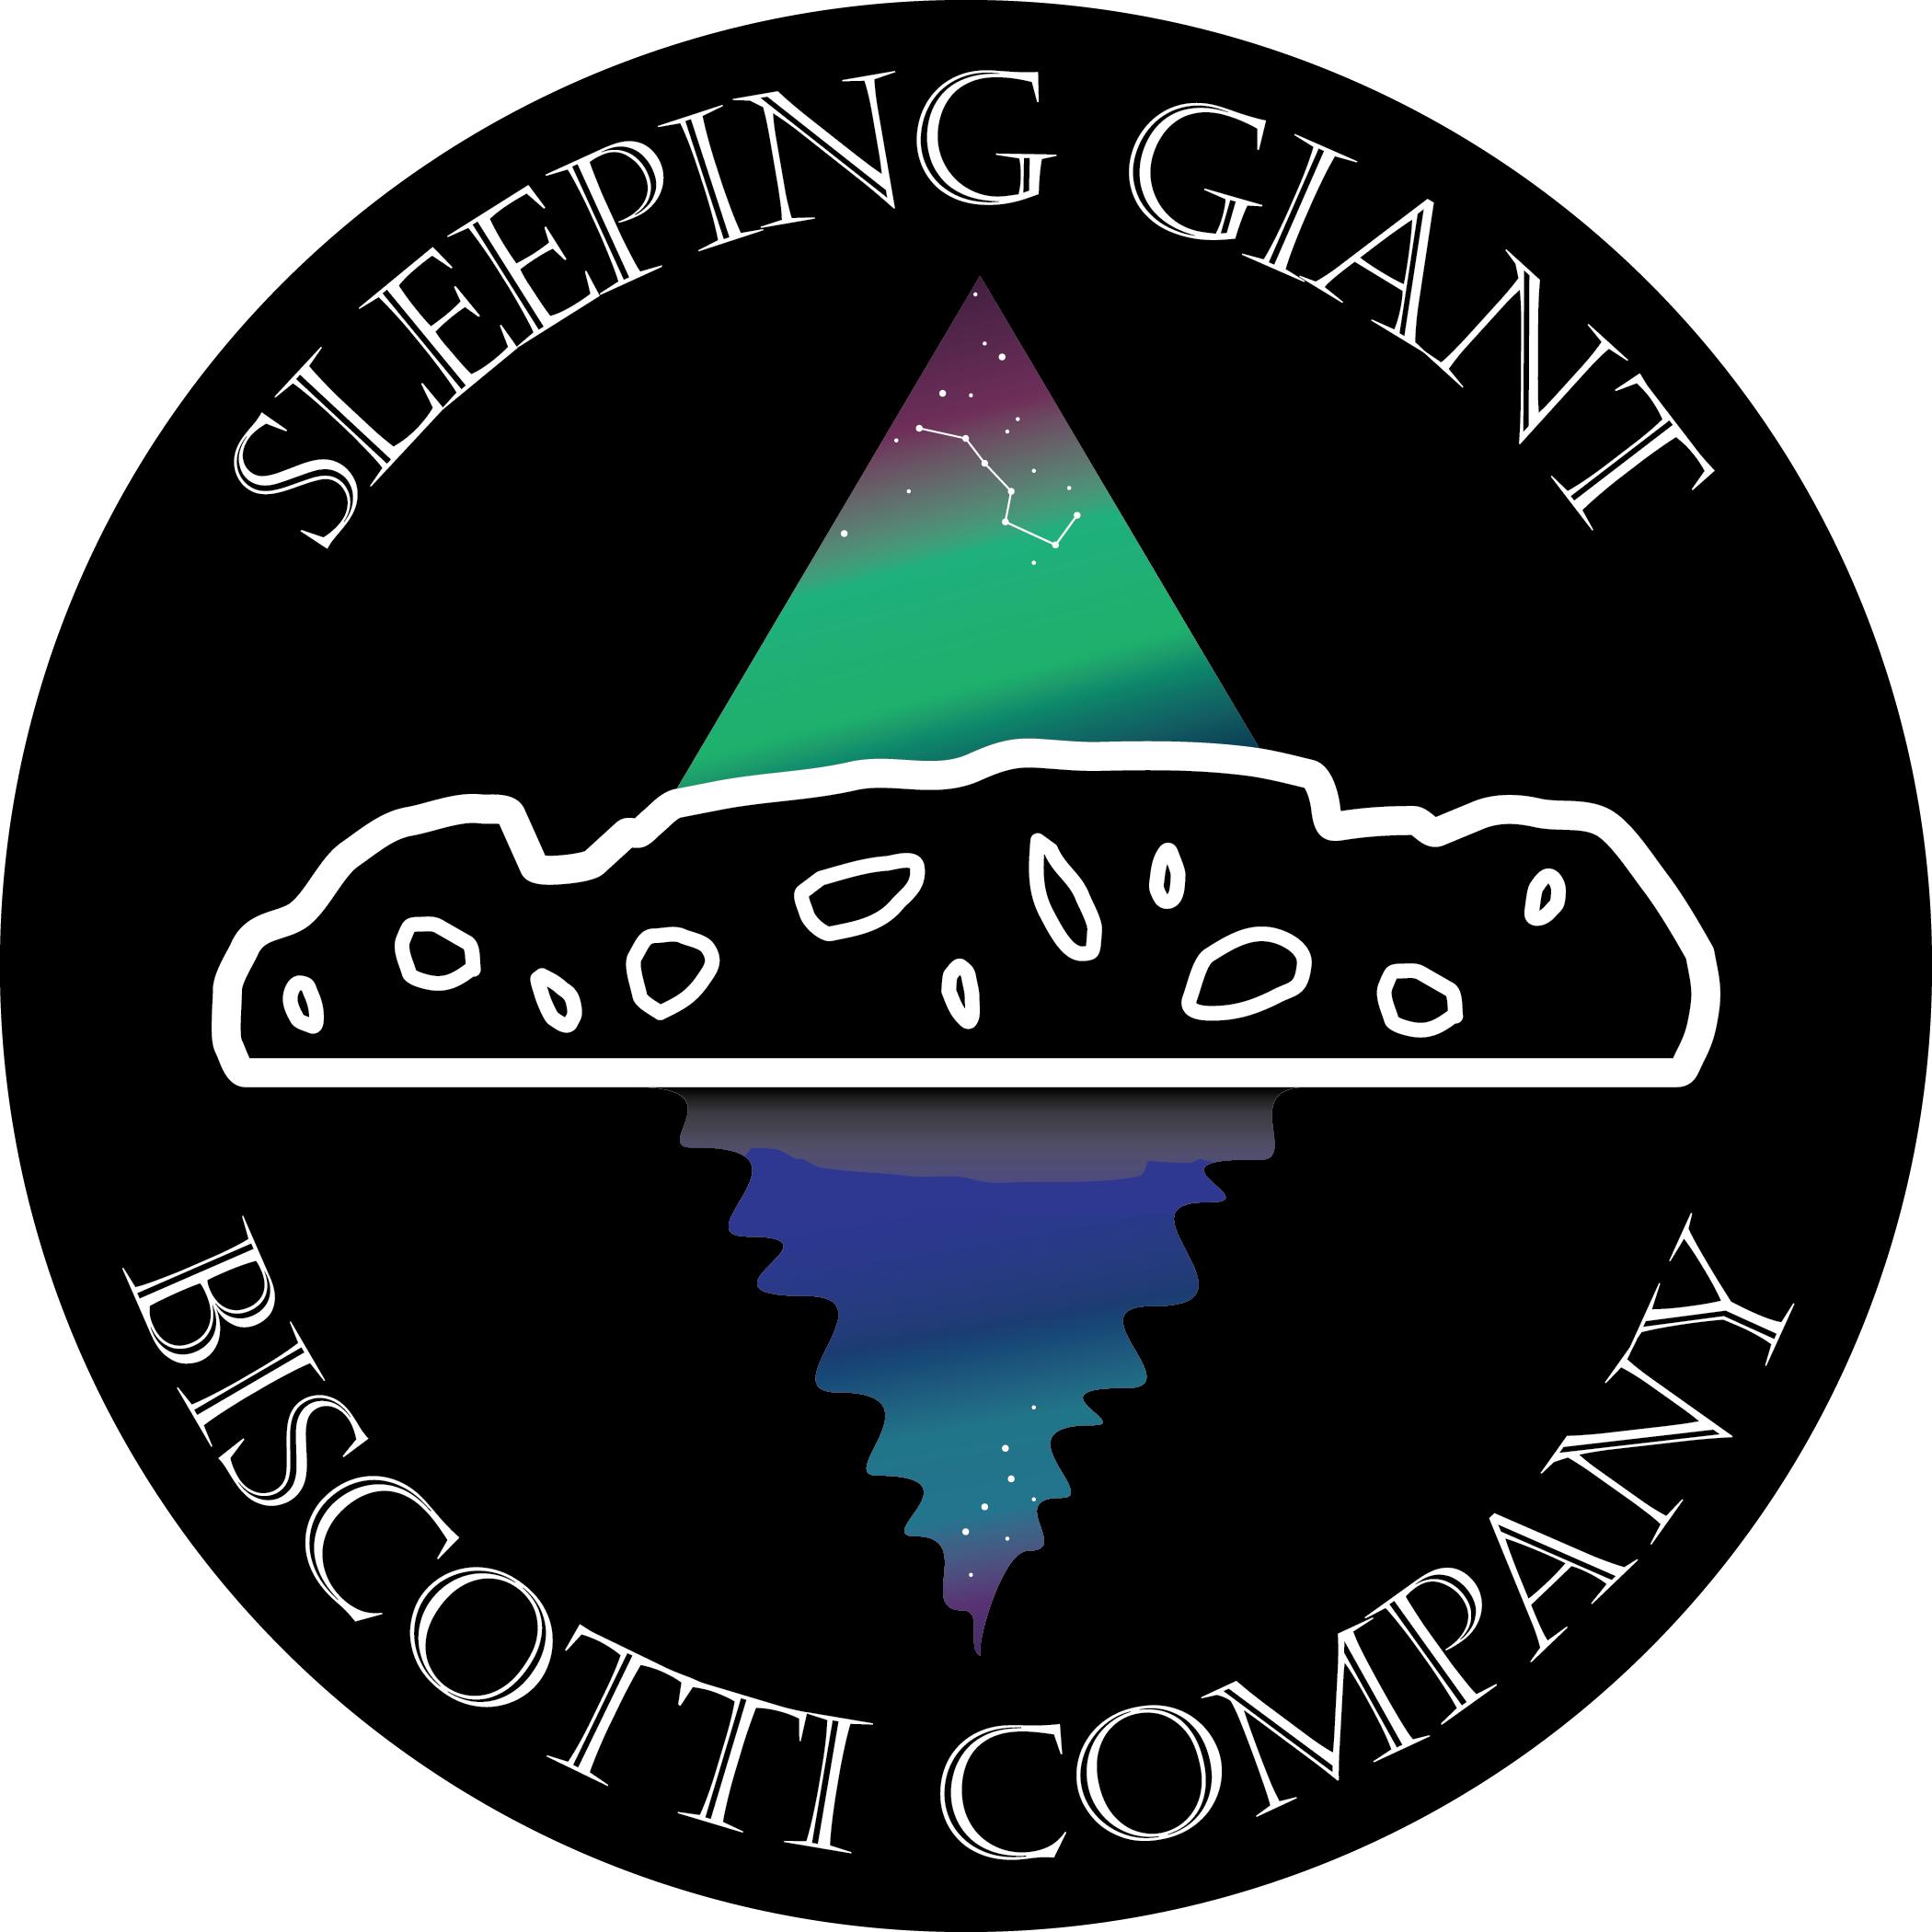 Sleeping Giant Biscotti Company